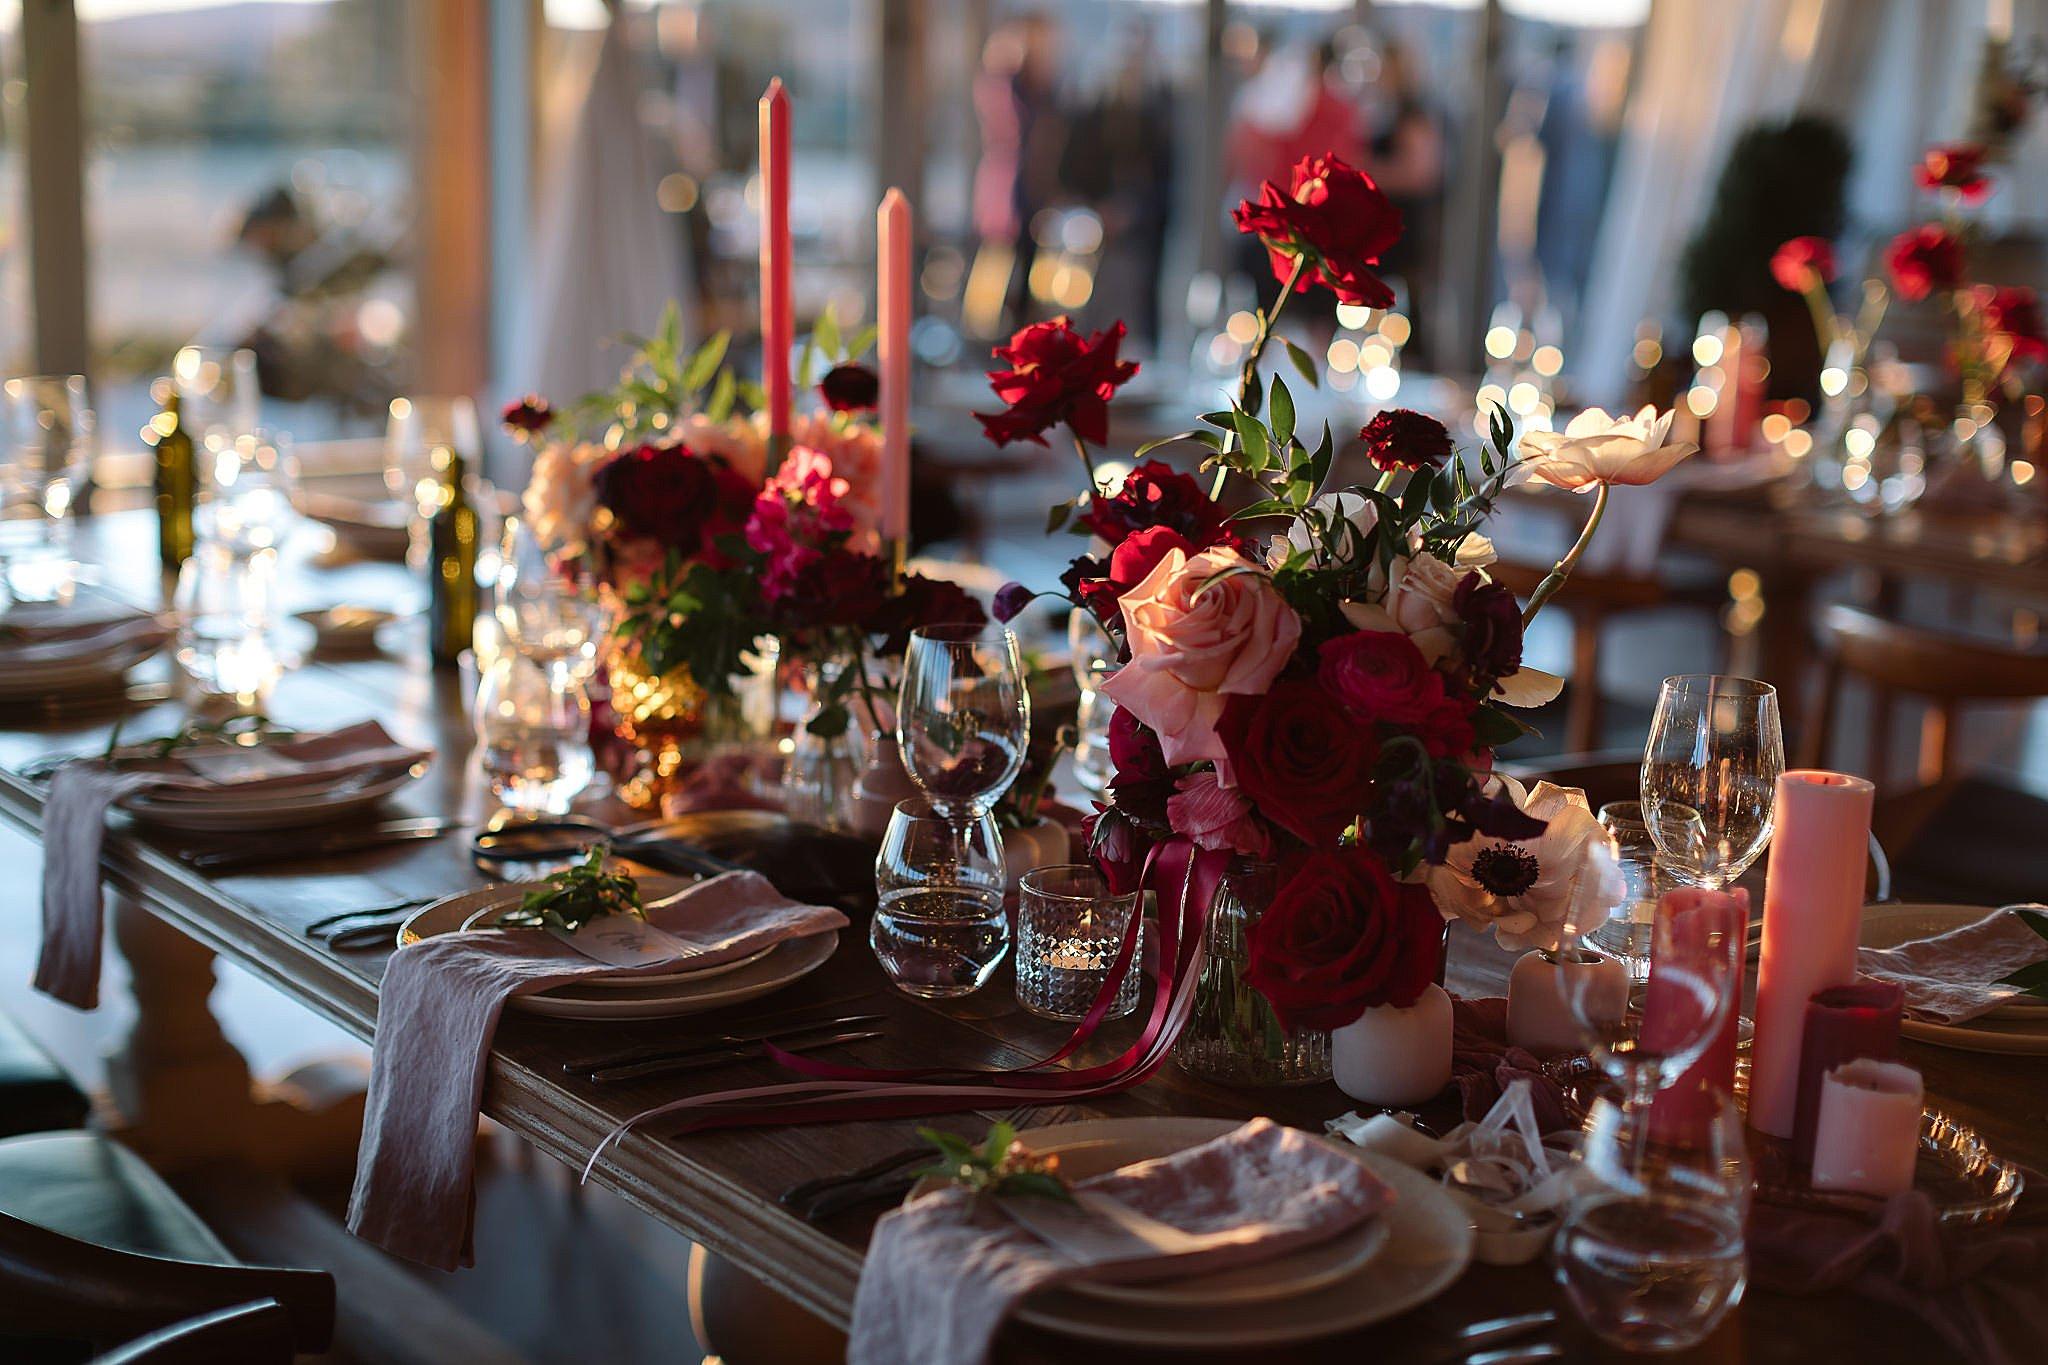 canberra florist,country wedding,Canberra Wedding Photographer,canberra wedding,canberra weddings,Keepsakephoto by the Keeffes,ACT wedding photographer,destination wedding photography,Southern Highlands Wedding,South Coast Wedding,